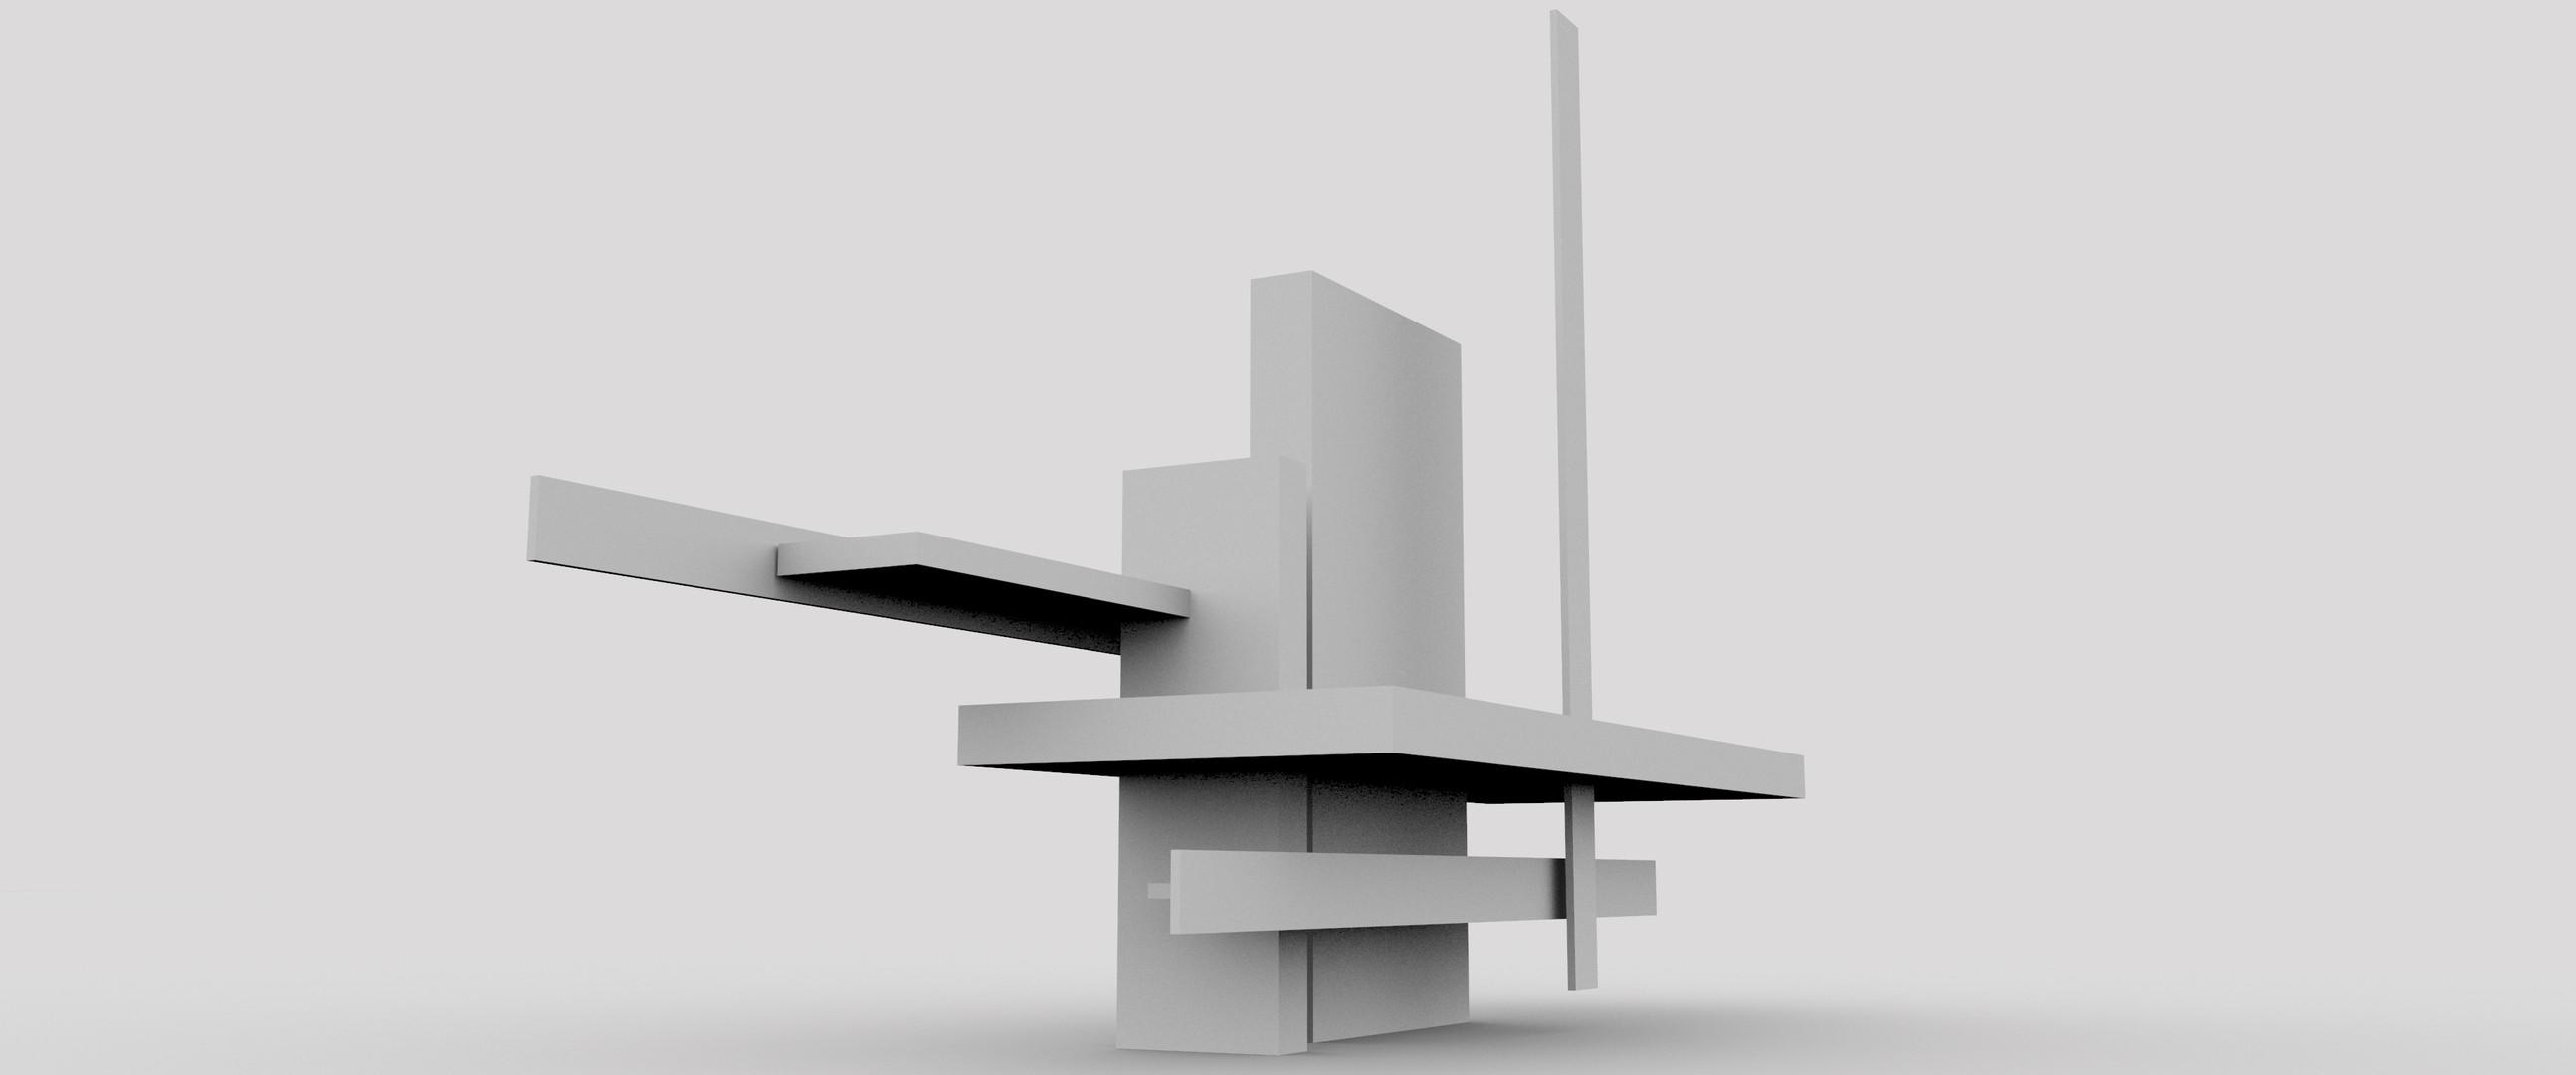 gd-gd2-ferencz-ward-render-1.jpg